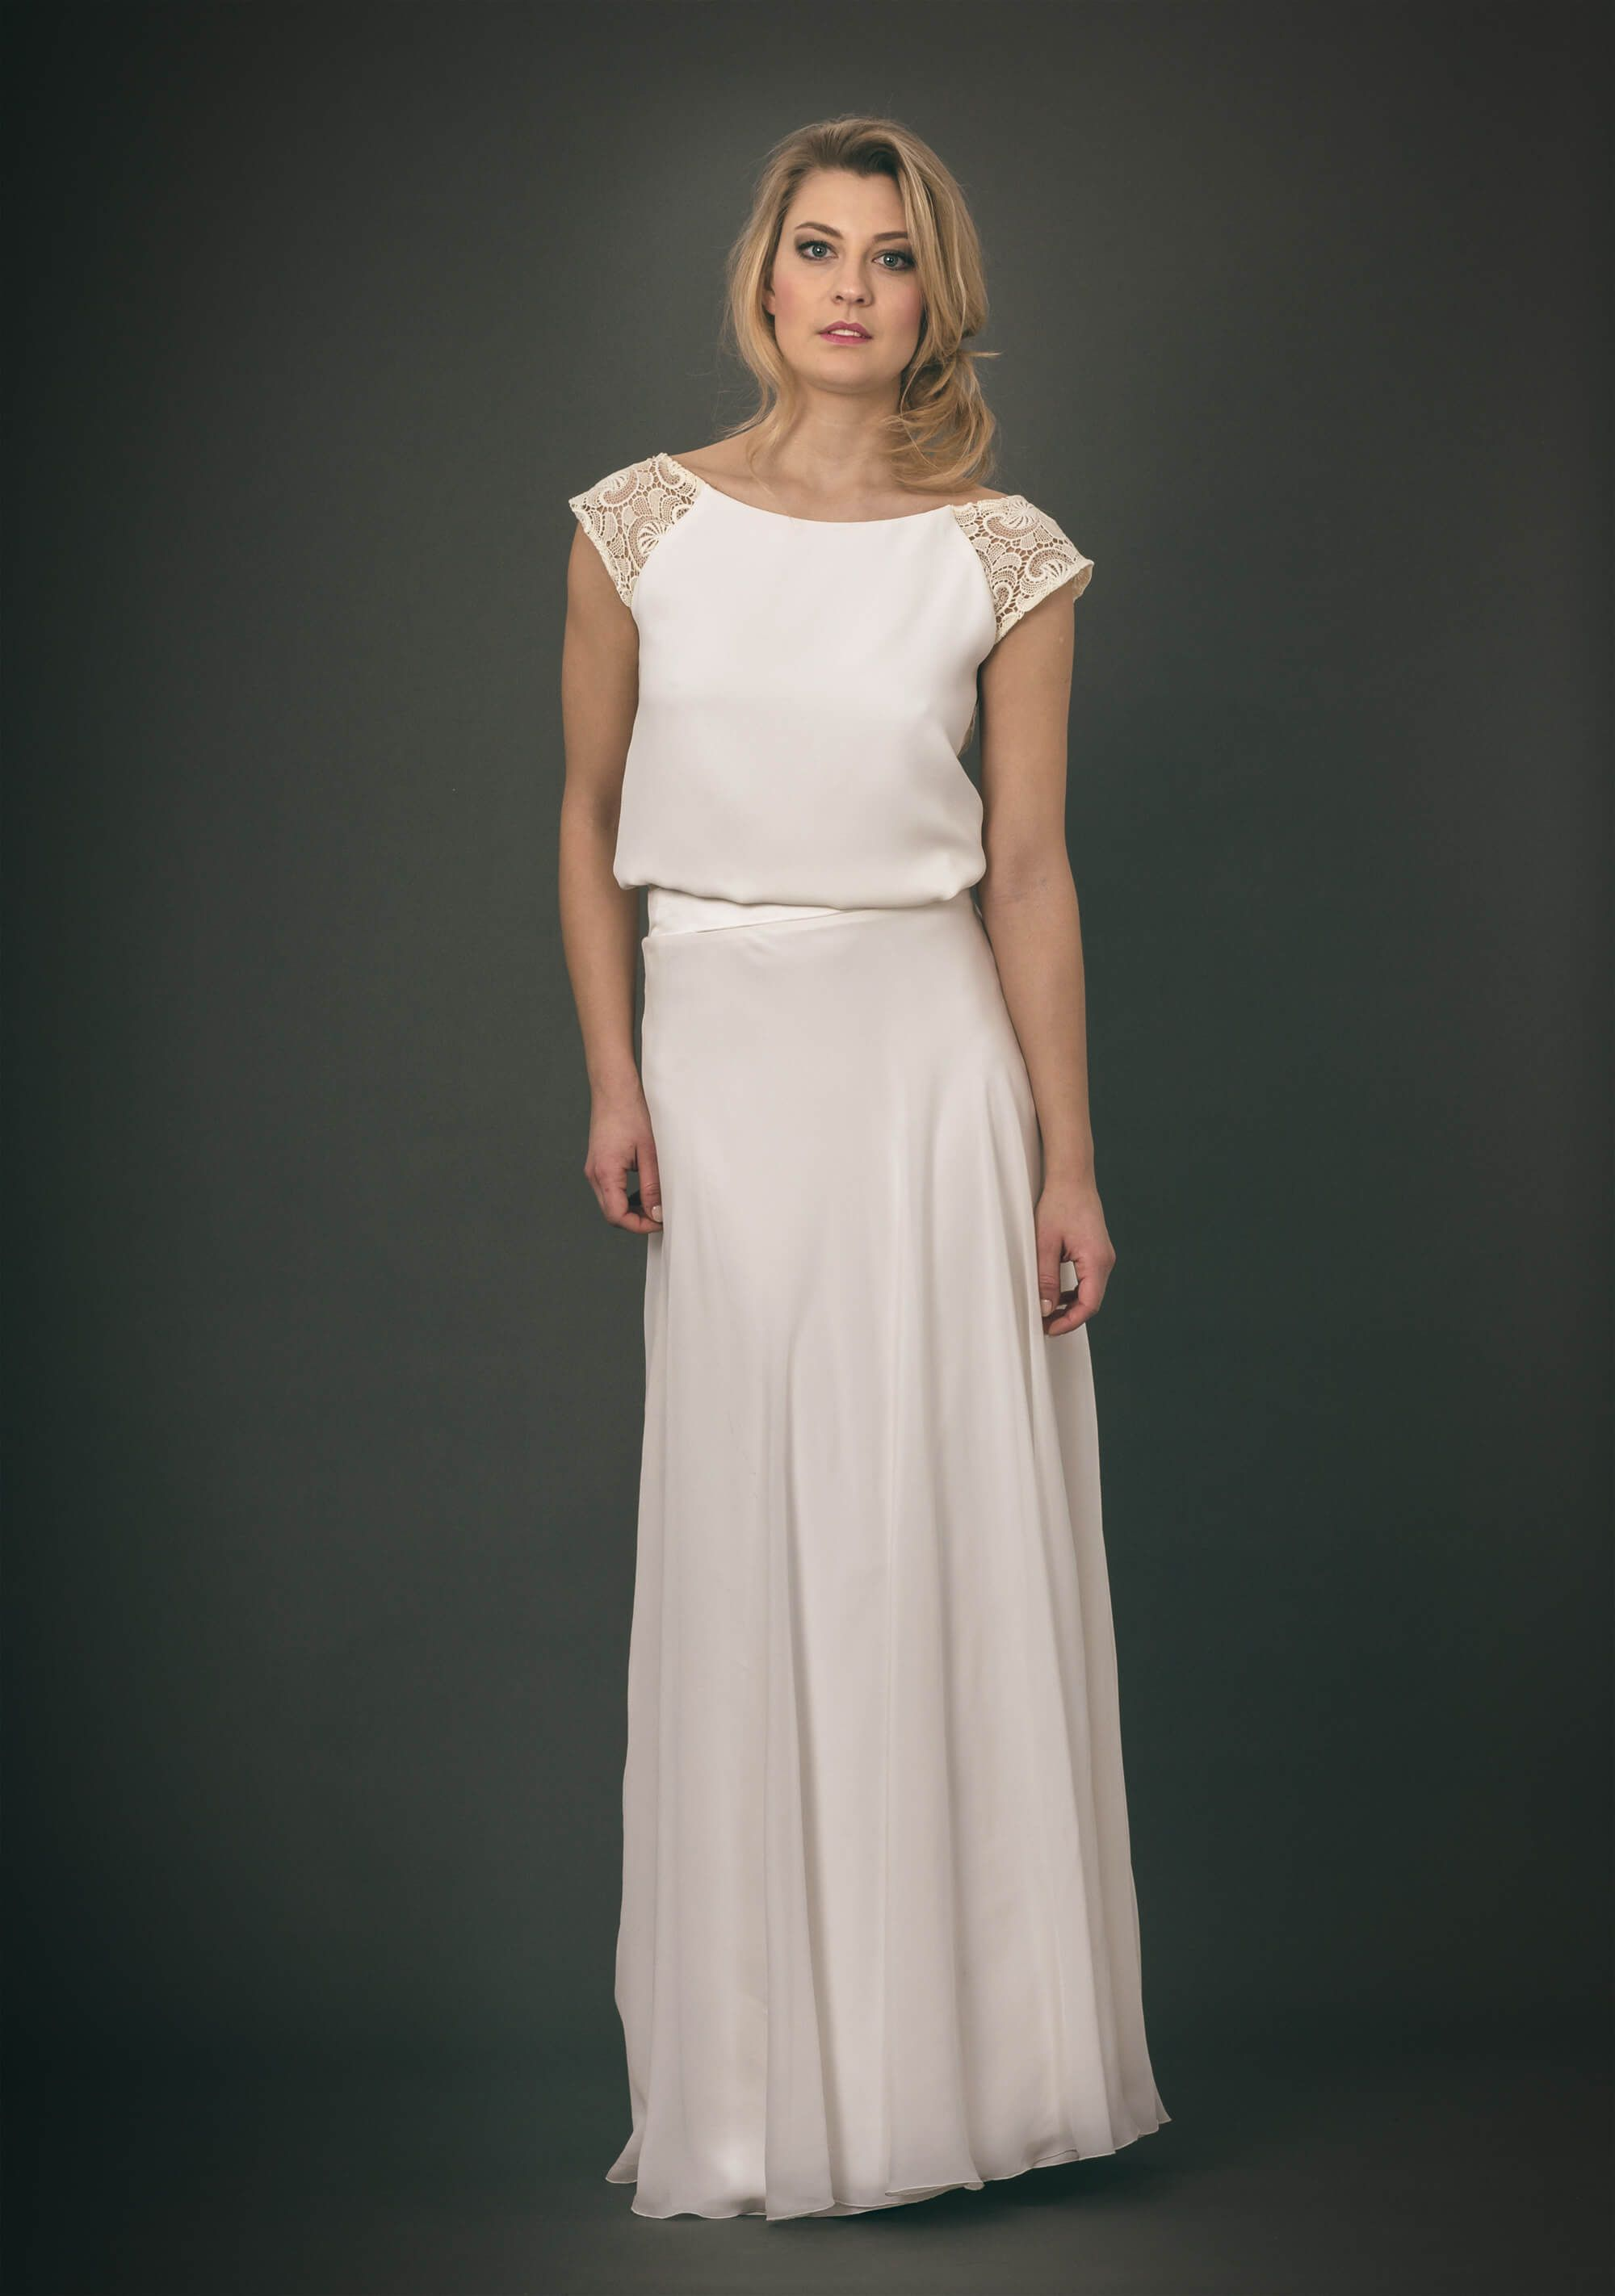 Brautkleid MEGAN & VALENTINA | Kleid | Pinterest